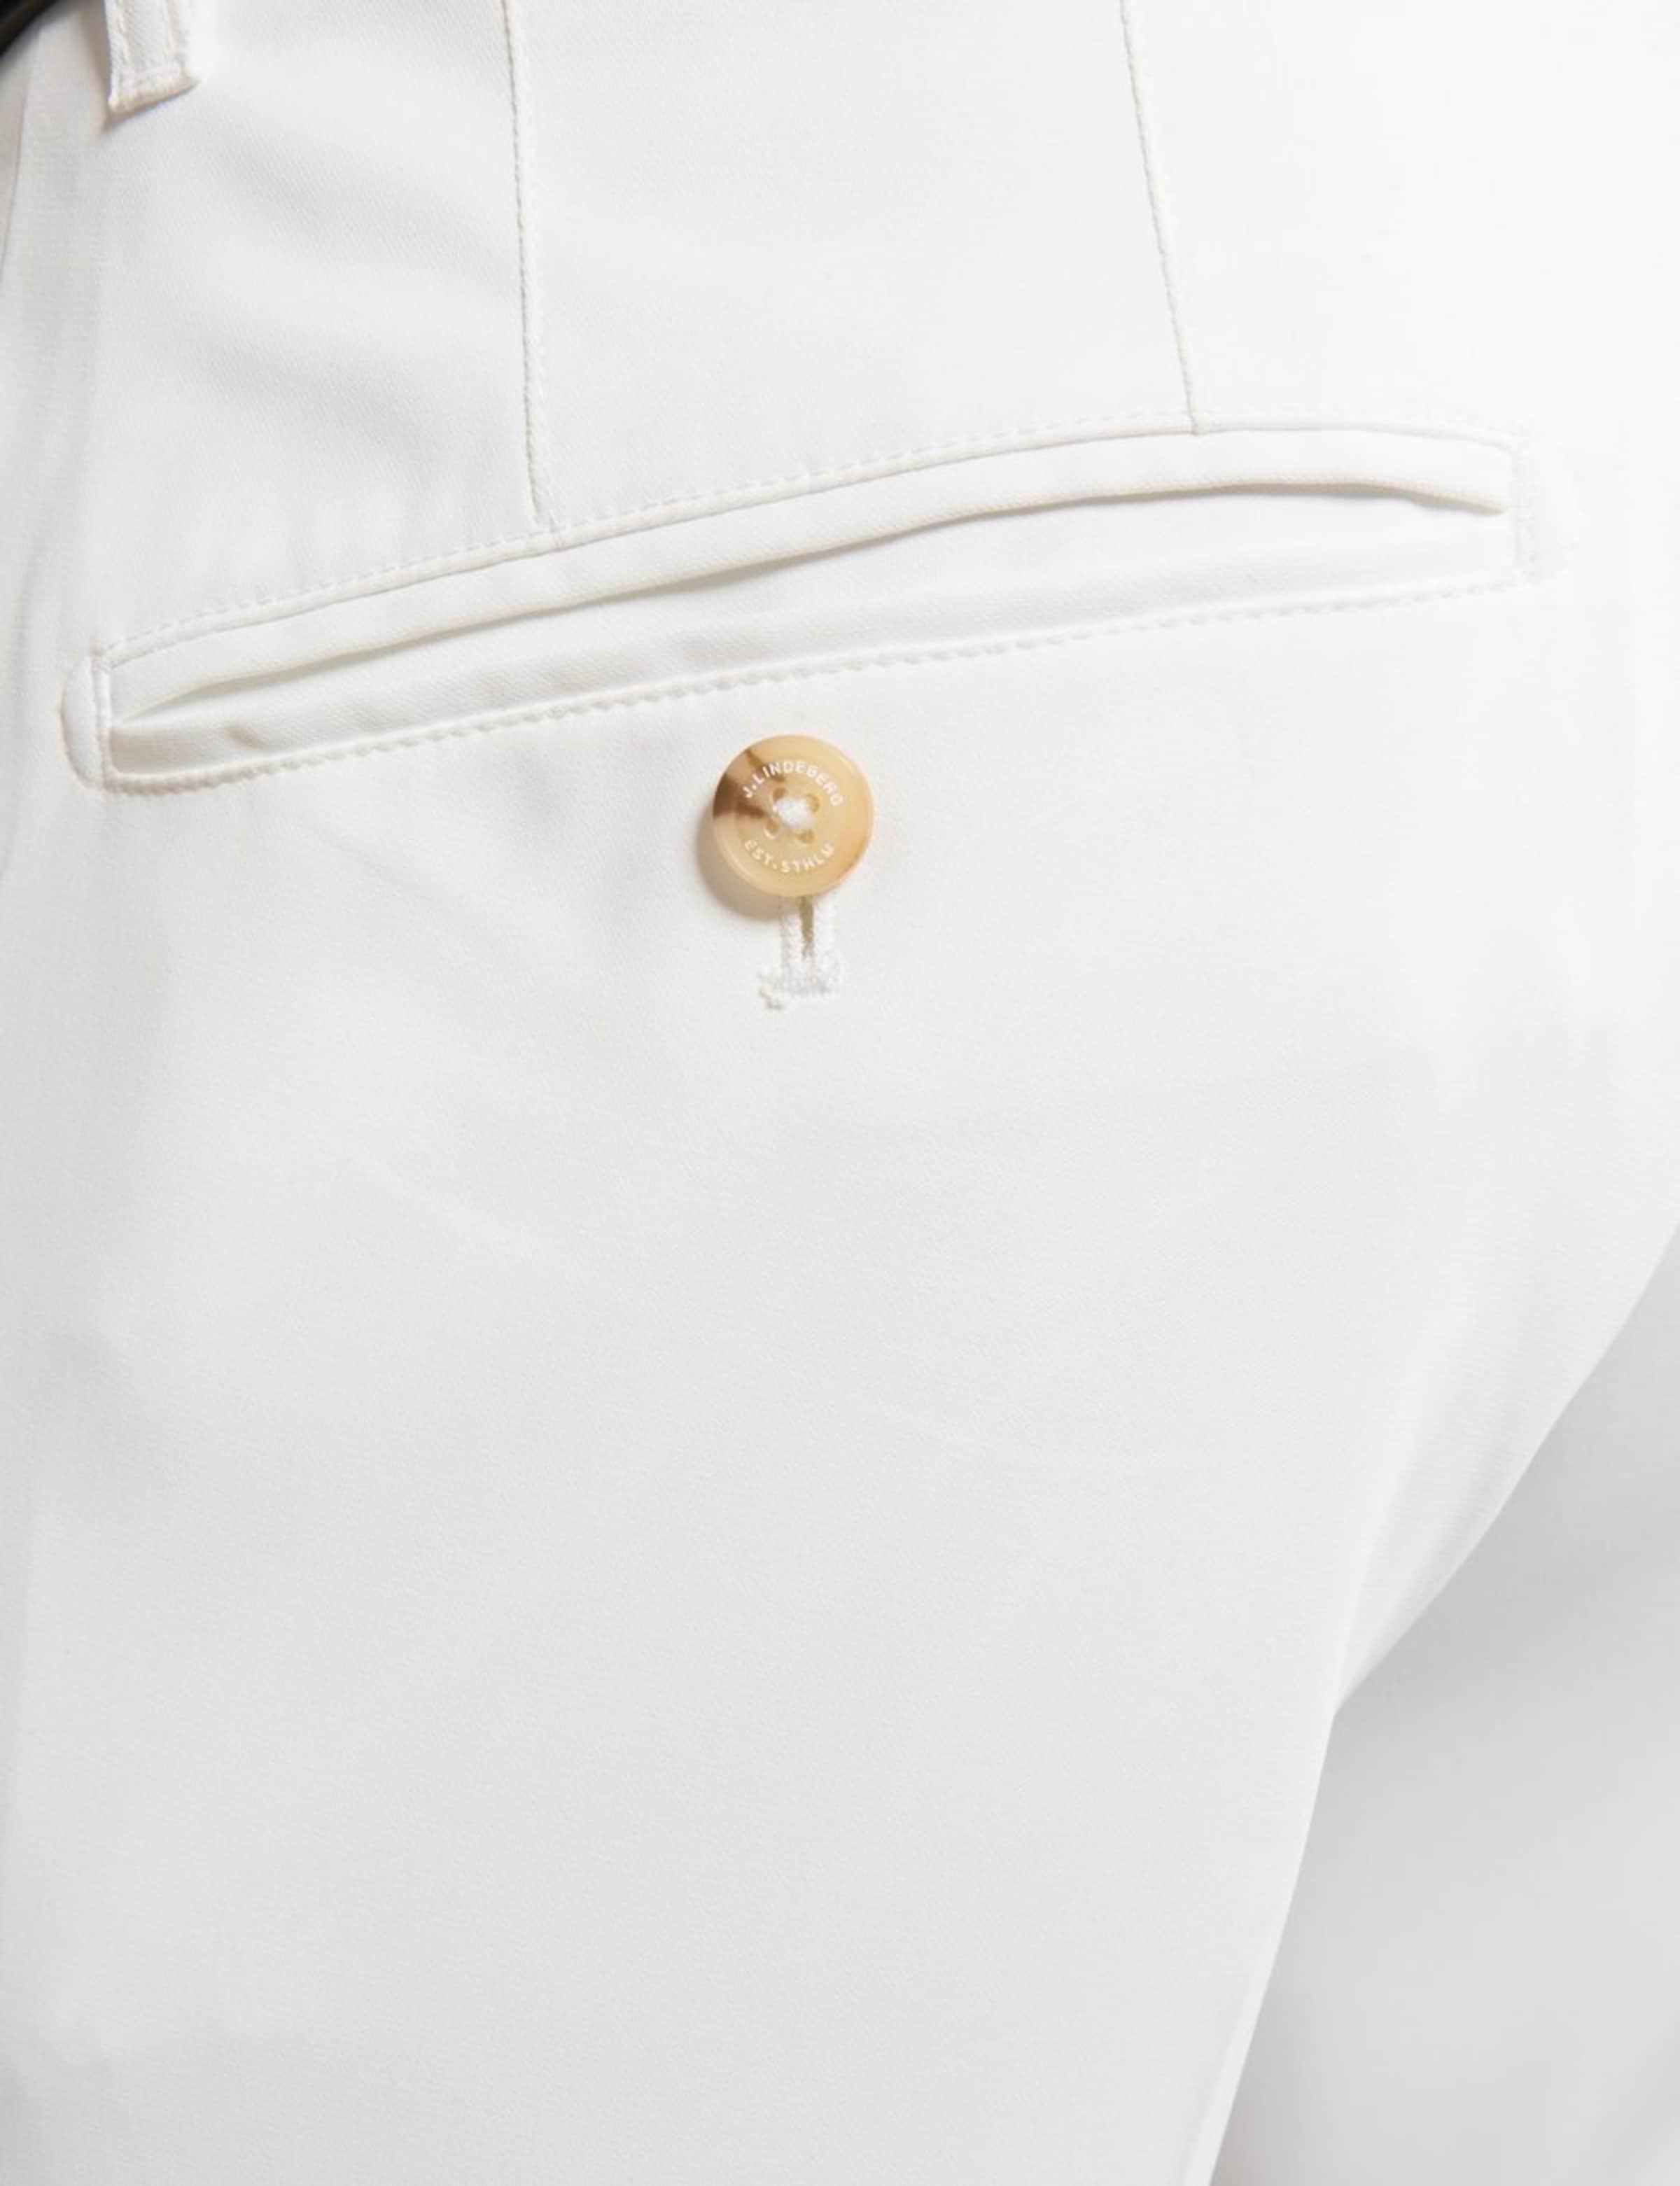 Freies Verschiffen Geniue Händler Qualität Outlet-Store J.Lindeberg 'Ellott' Regular Micro Stretch Hose Sast Günstig Online Outlet Billige Qualität Outlet Mode-Stil loNWZDCt